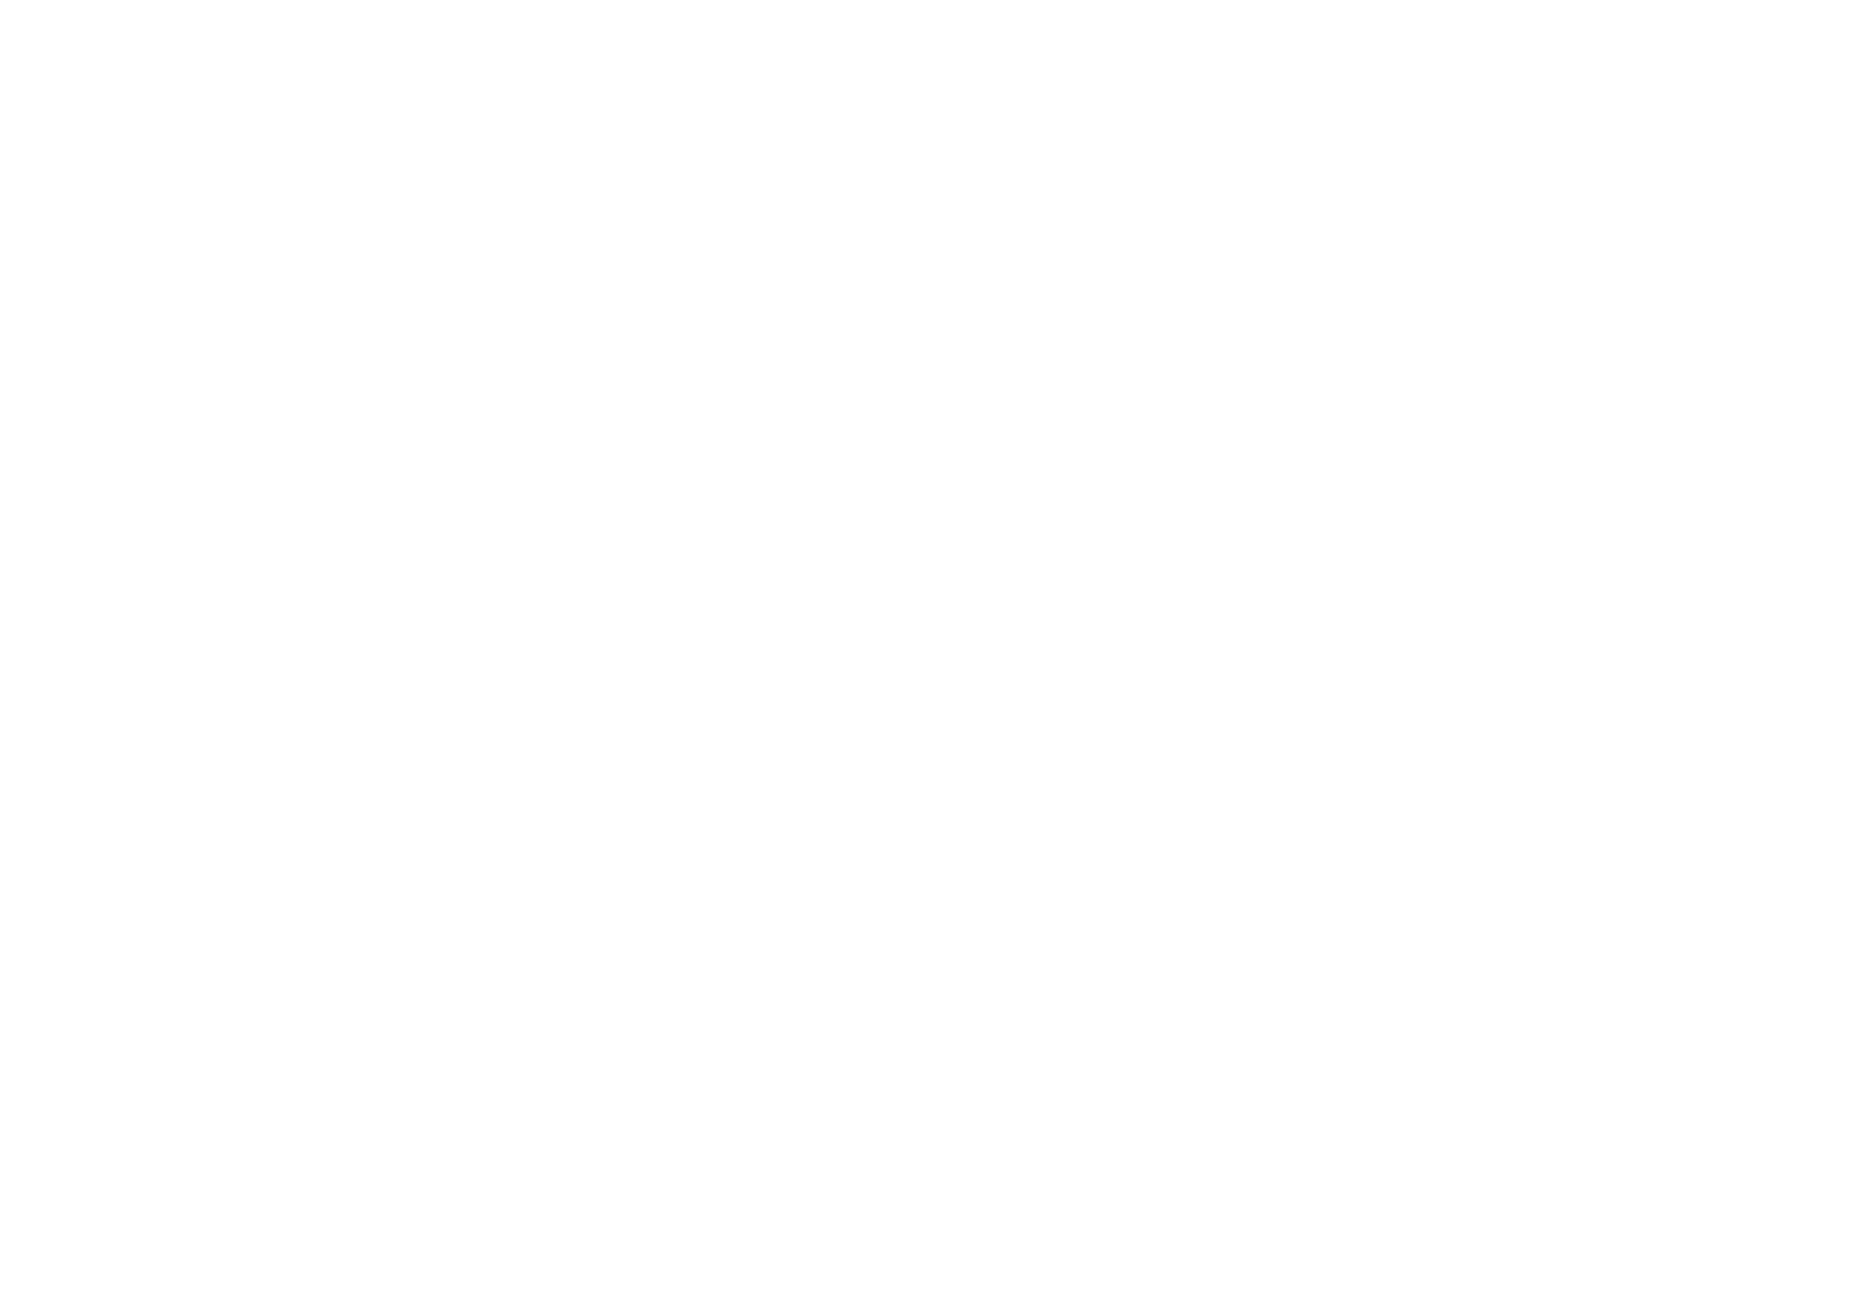 IWC_v01 White.png